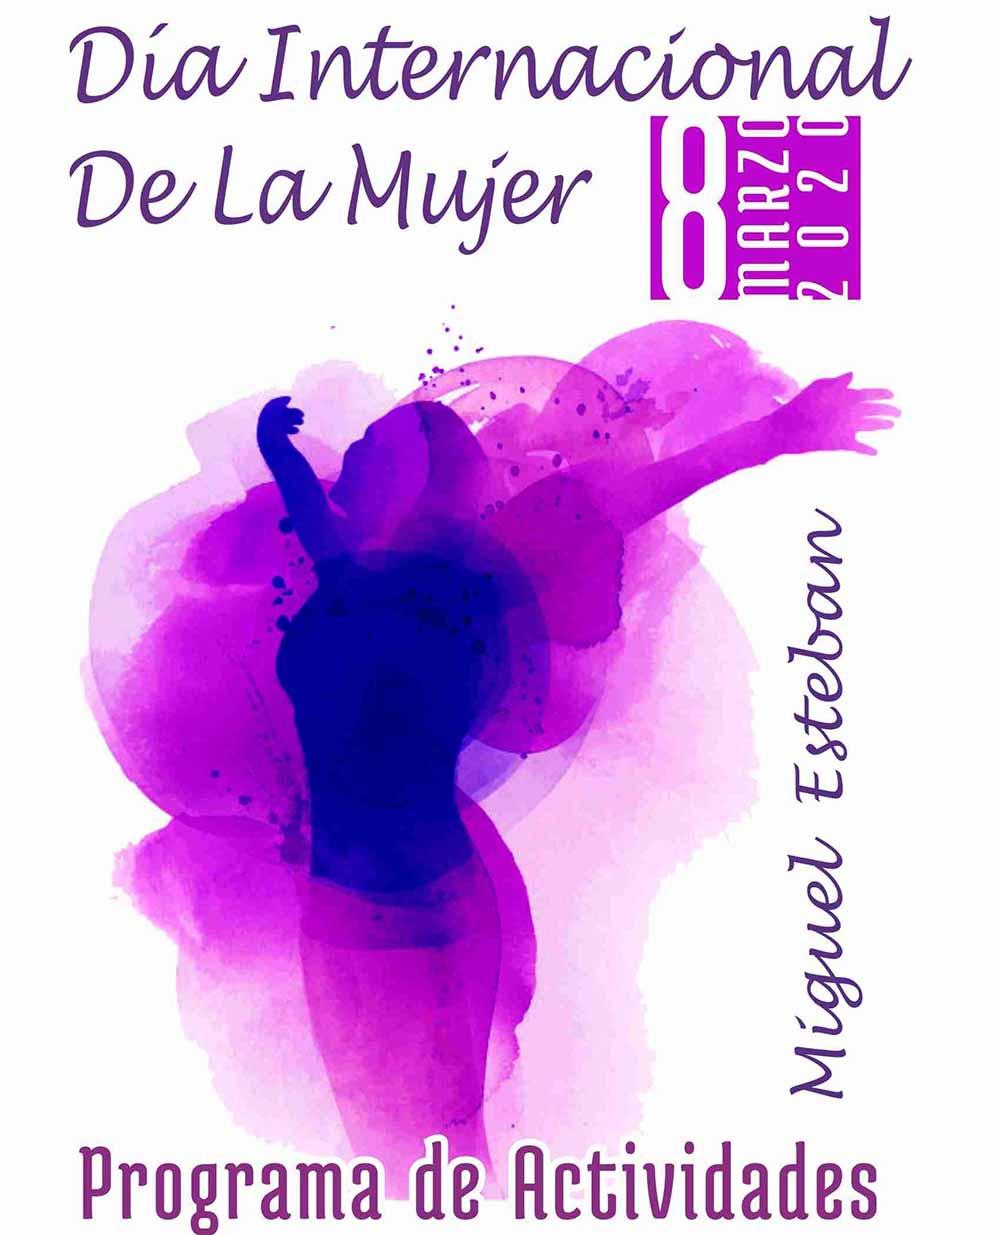 actividades 8 marzo ext Miguel Esteban 2020 (3)